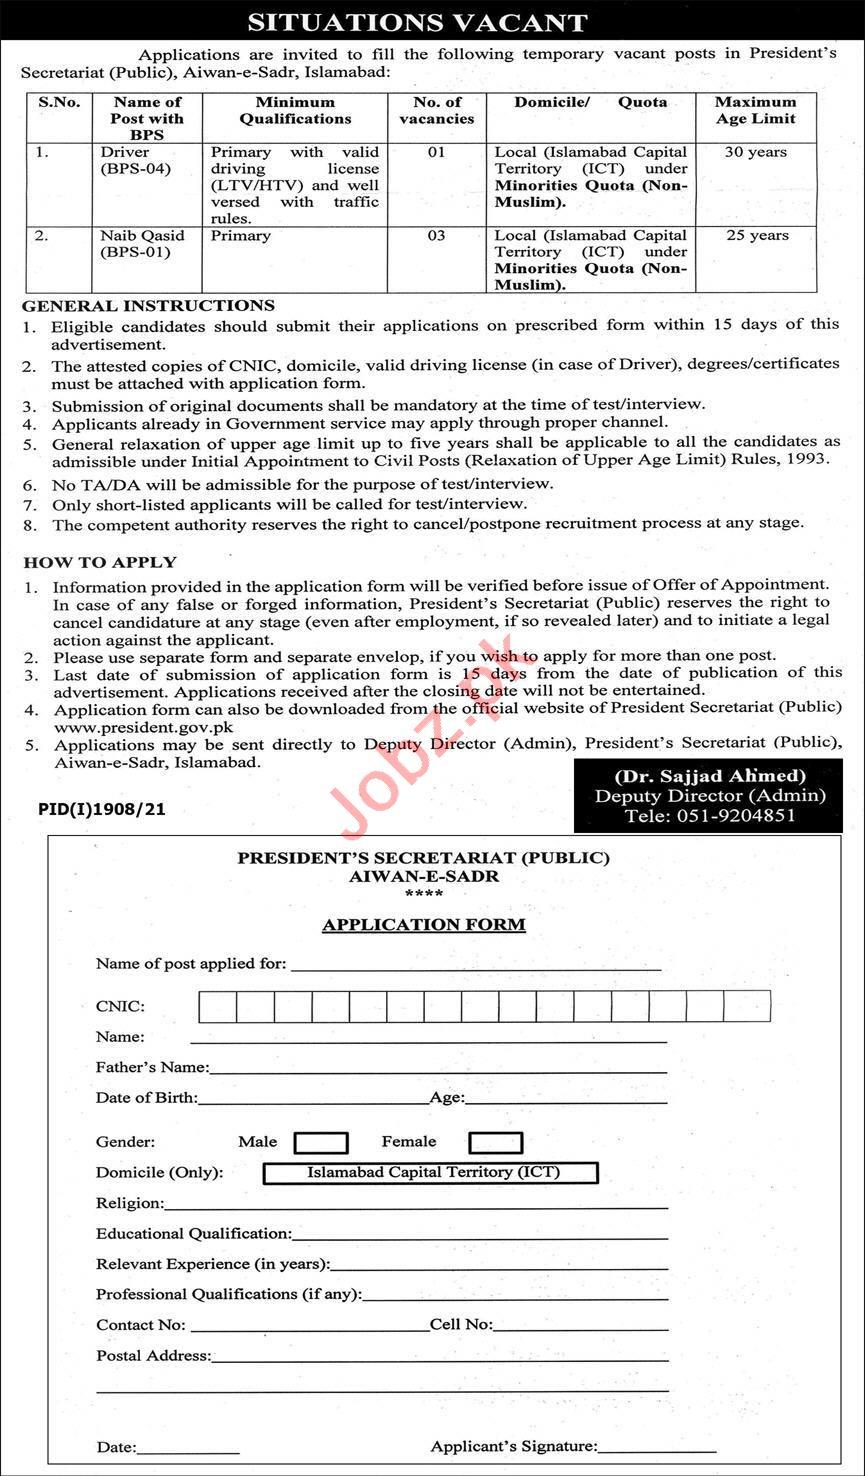 President Secretariat Public Aiwan e Sadr Islamabad Job 2021